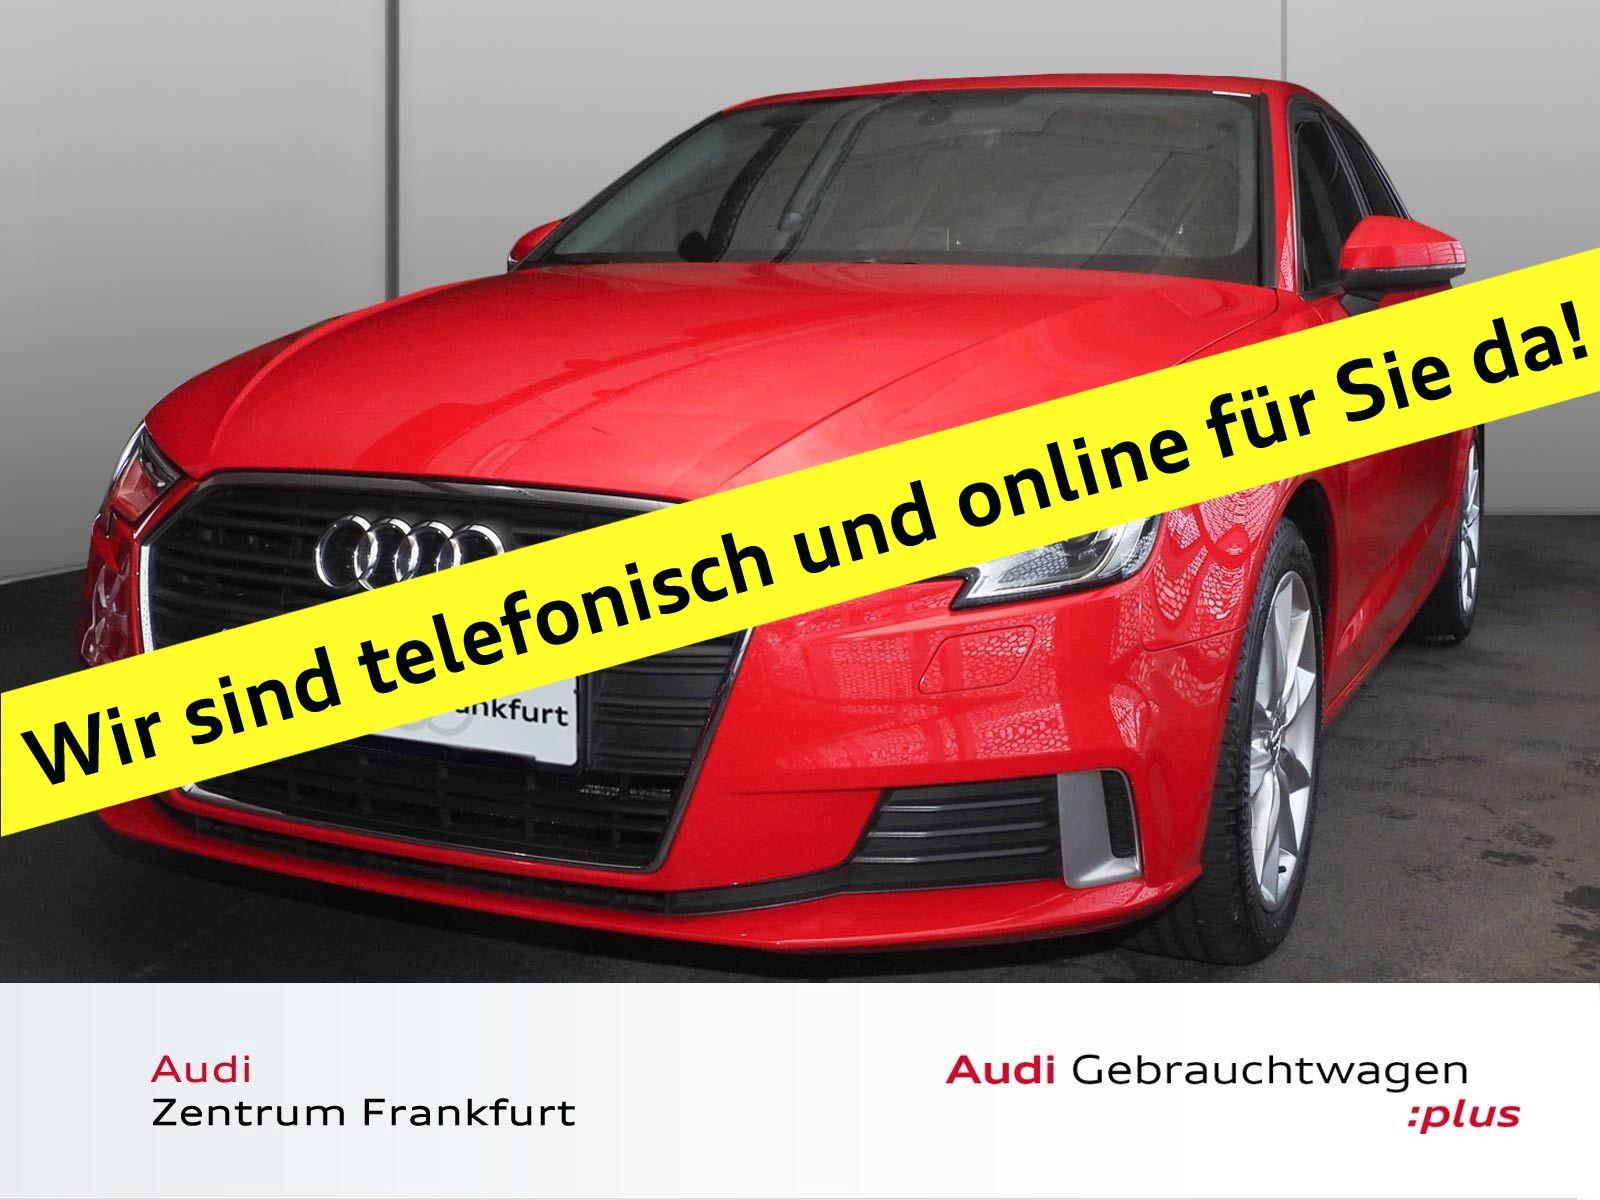 Audi A3 Sportback 2.0 TDI sport Navi Xenon DAB PDC Sitzheizung, Jahr 2018, Diesel